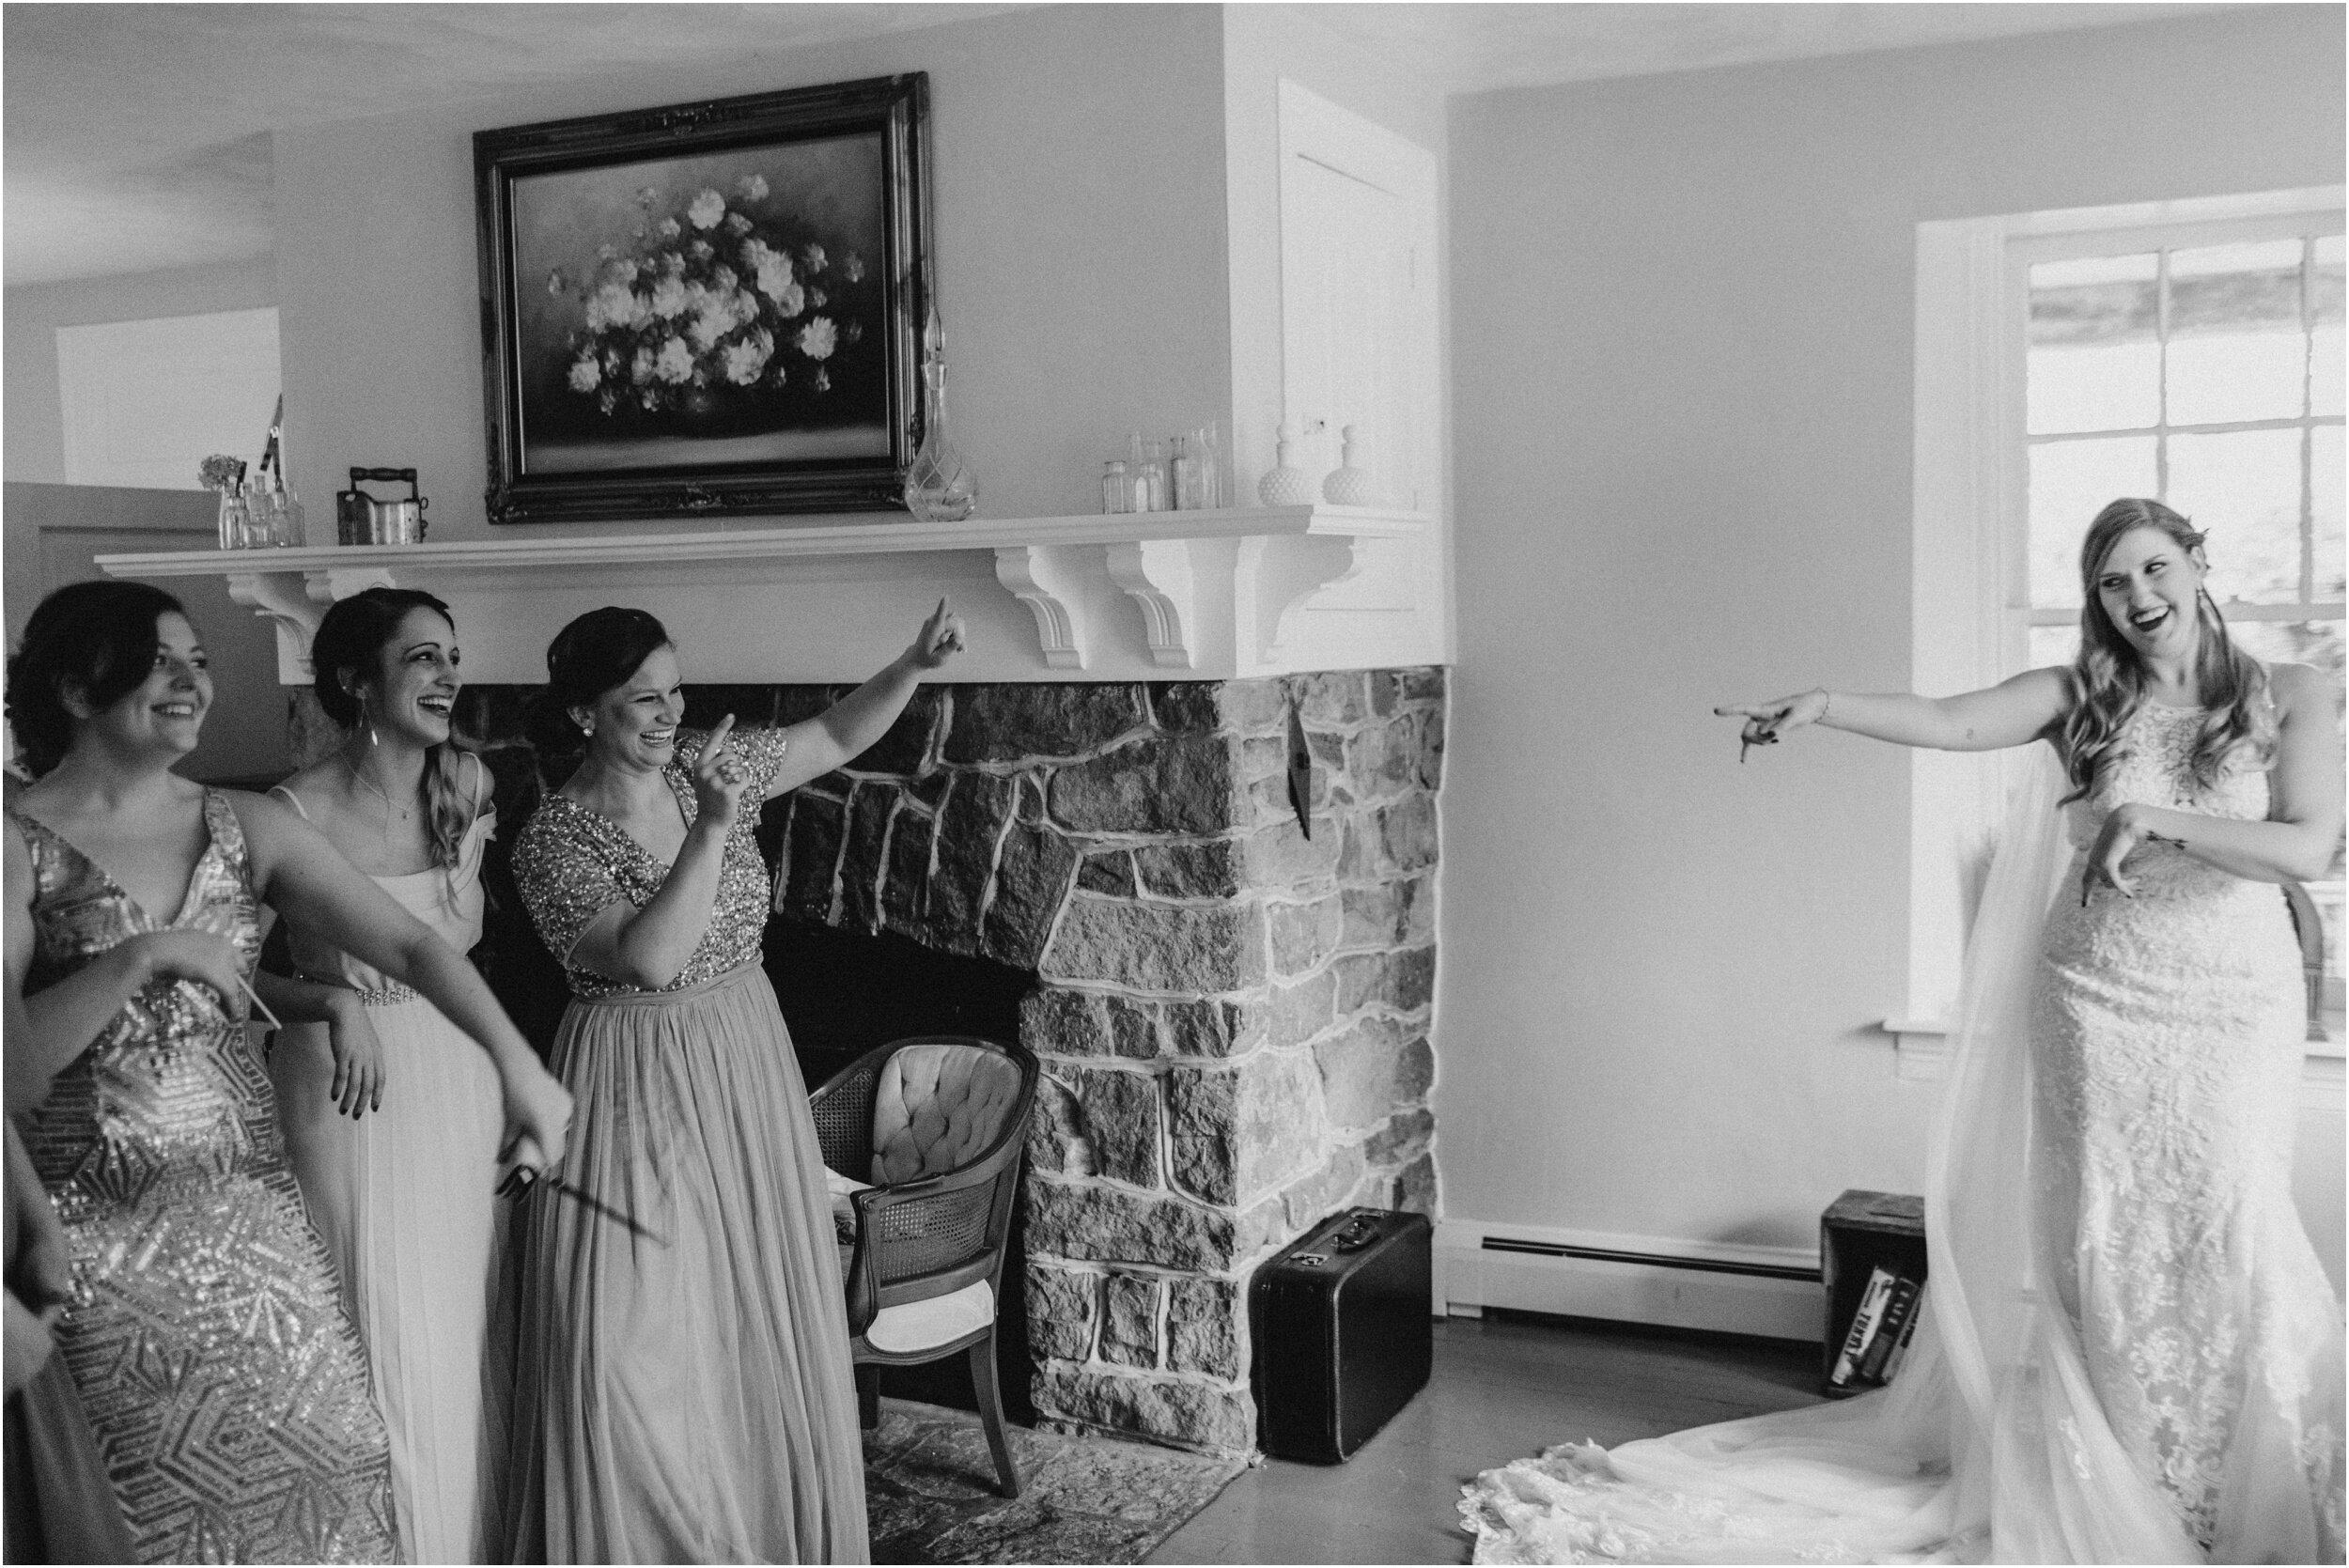 steph-and-jordan-cox-our-wedding-historic-shady-lane-compass-wedding-collective-hazel-lining-photography-destination-elopement-wedding-engagement-photography_0017.jpg